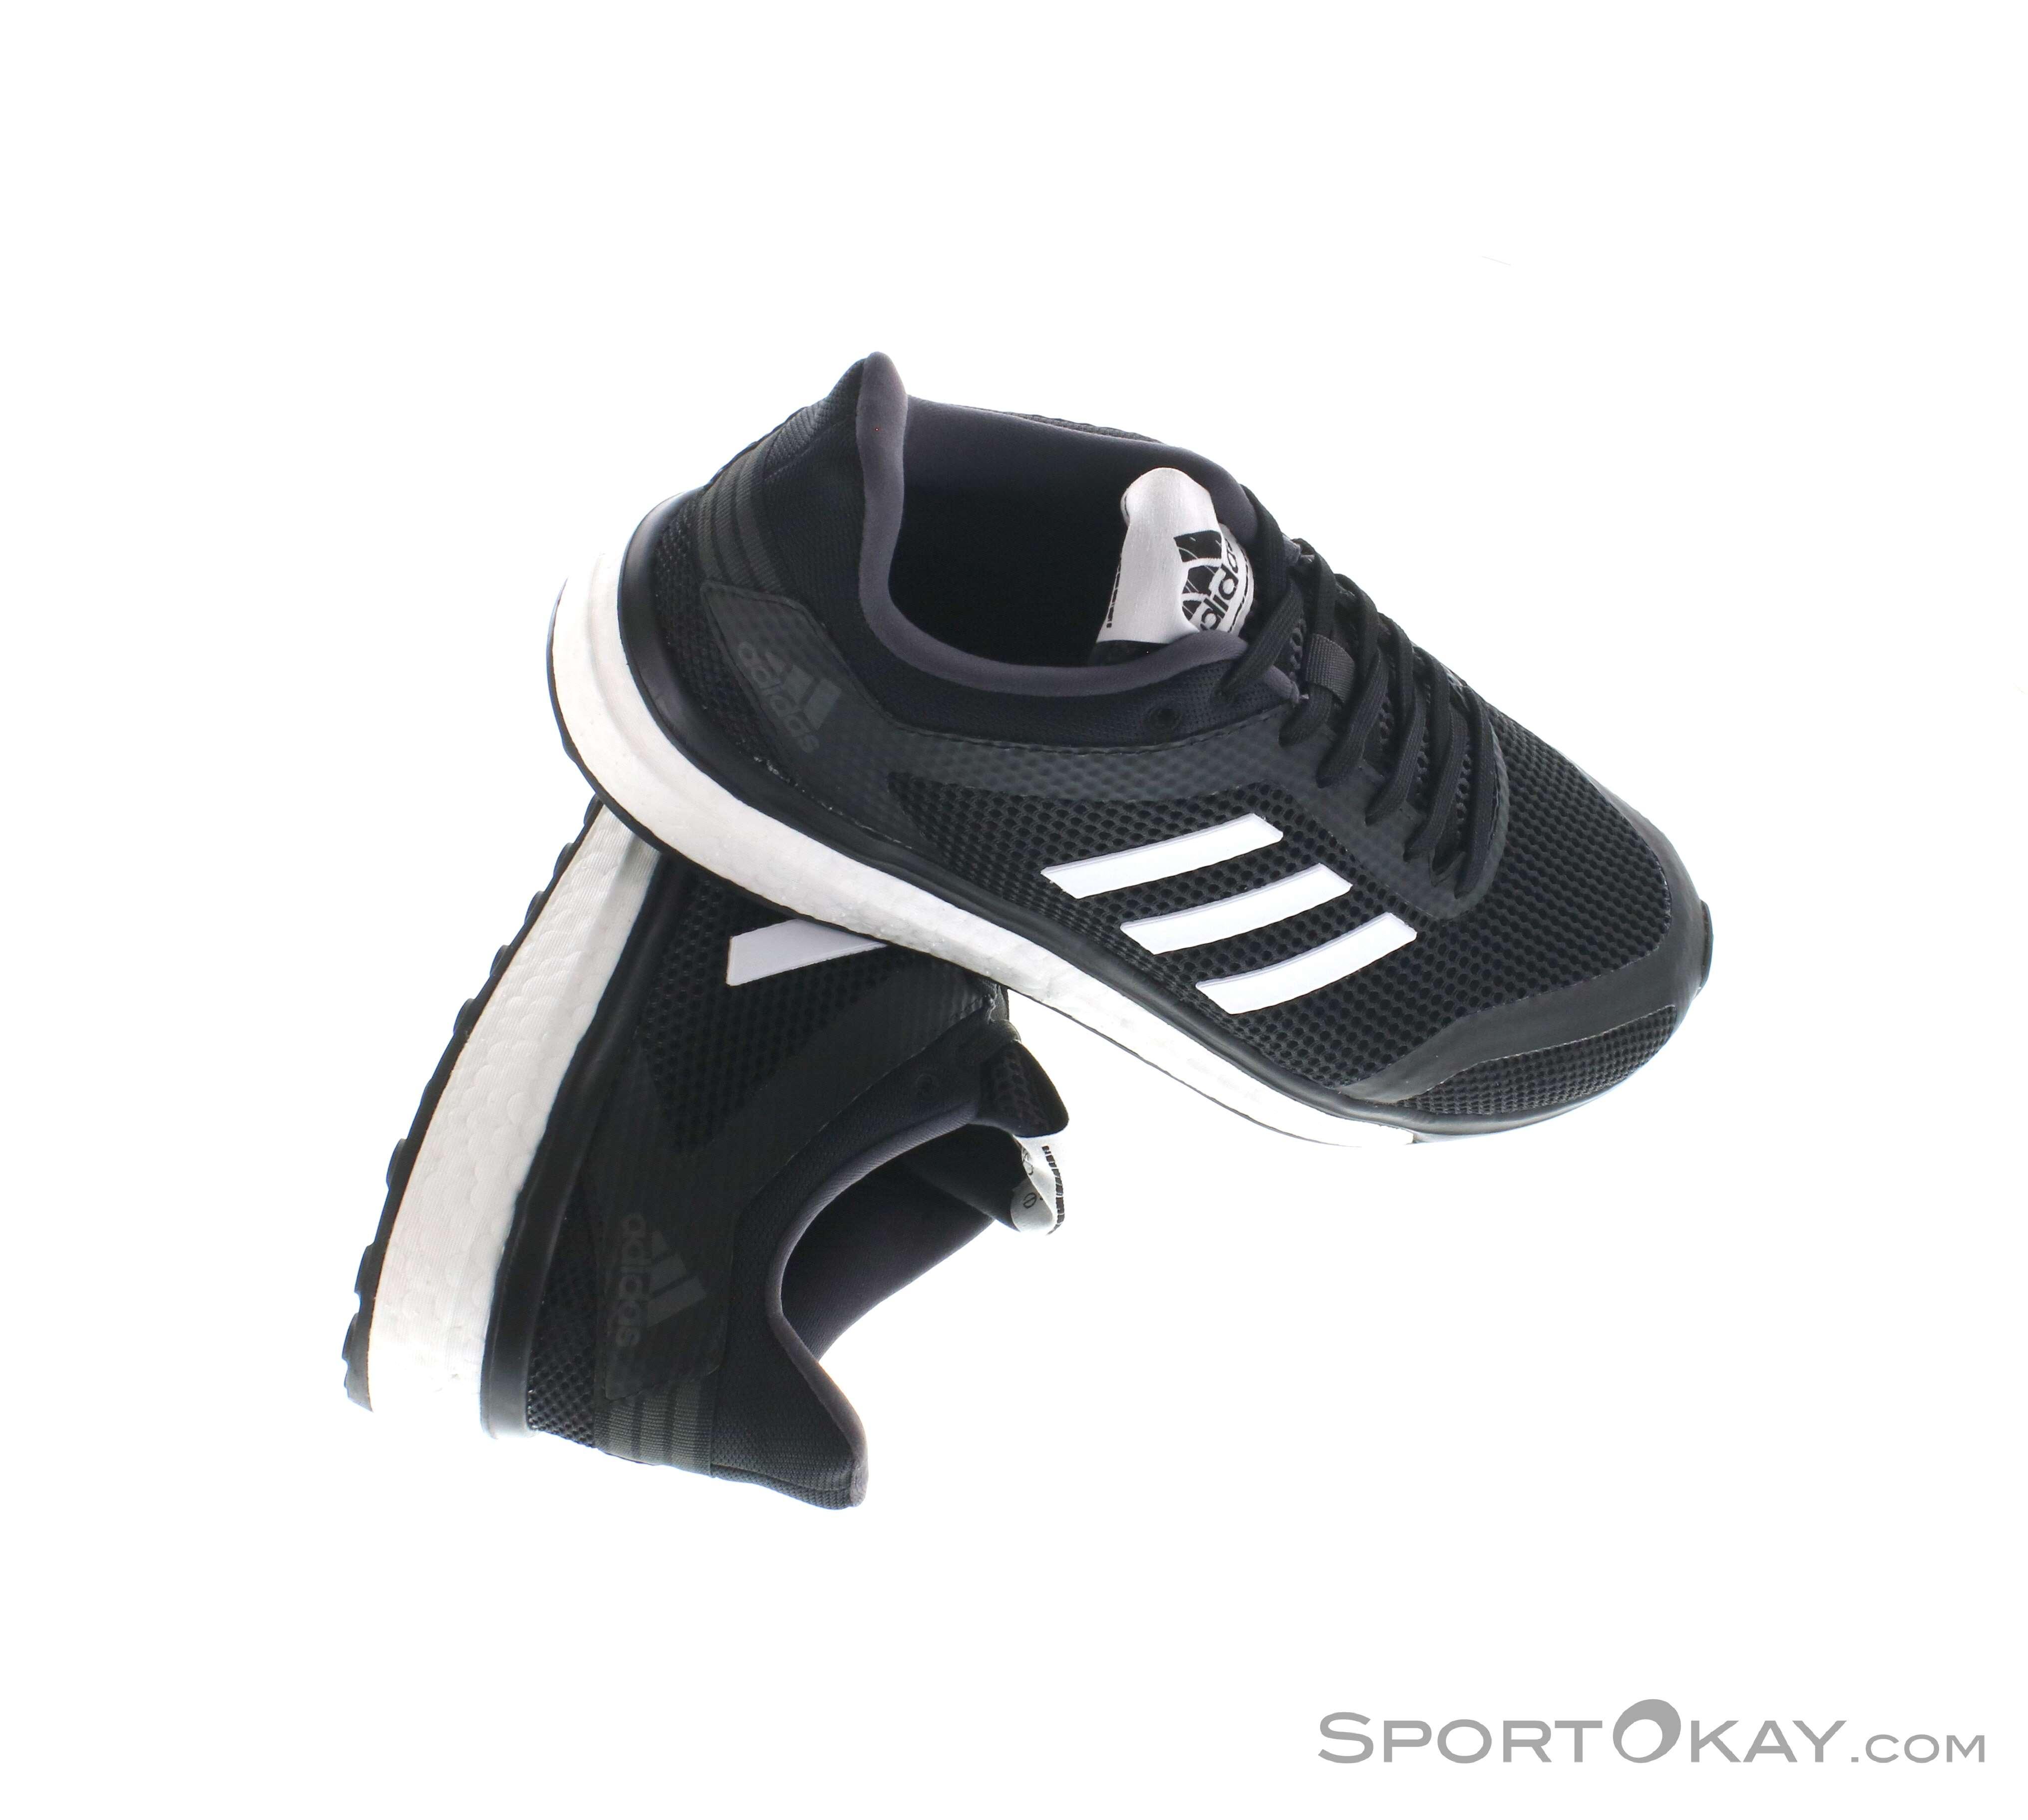 premium selection 83580 27bb3 adidas Response+M Herren Laufschuhe, adidas, Schwarz, , Herren, 0002-